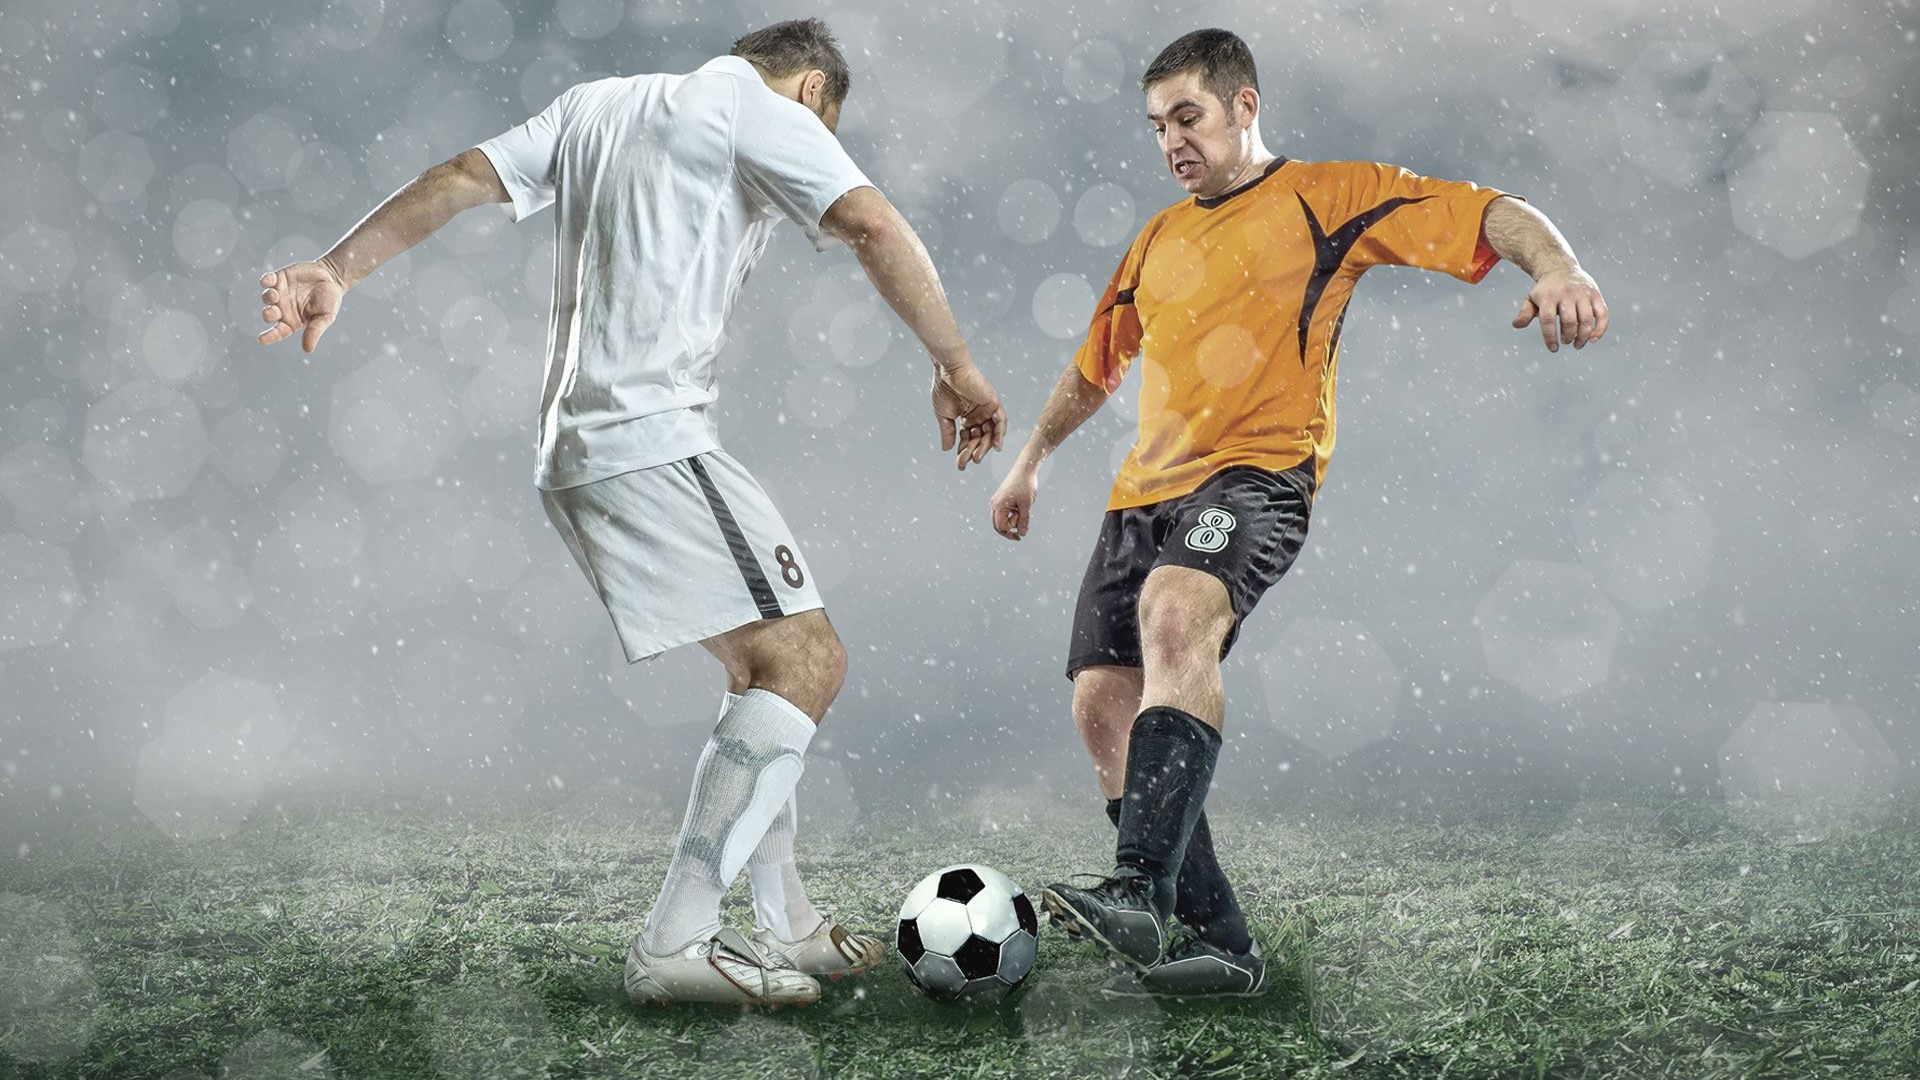 gloucester-rugby-vs-bristol-rugby-live